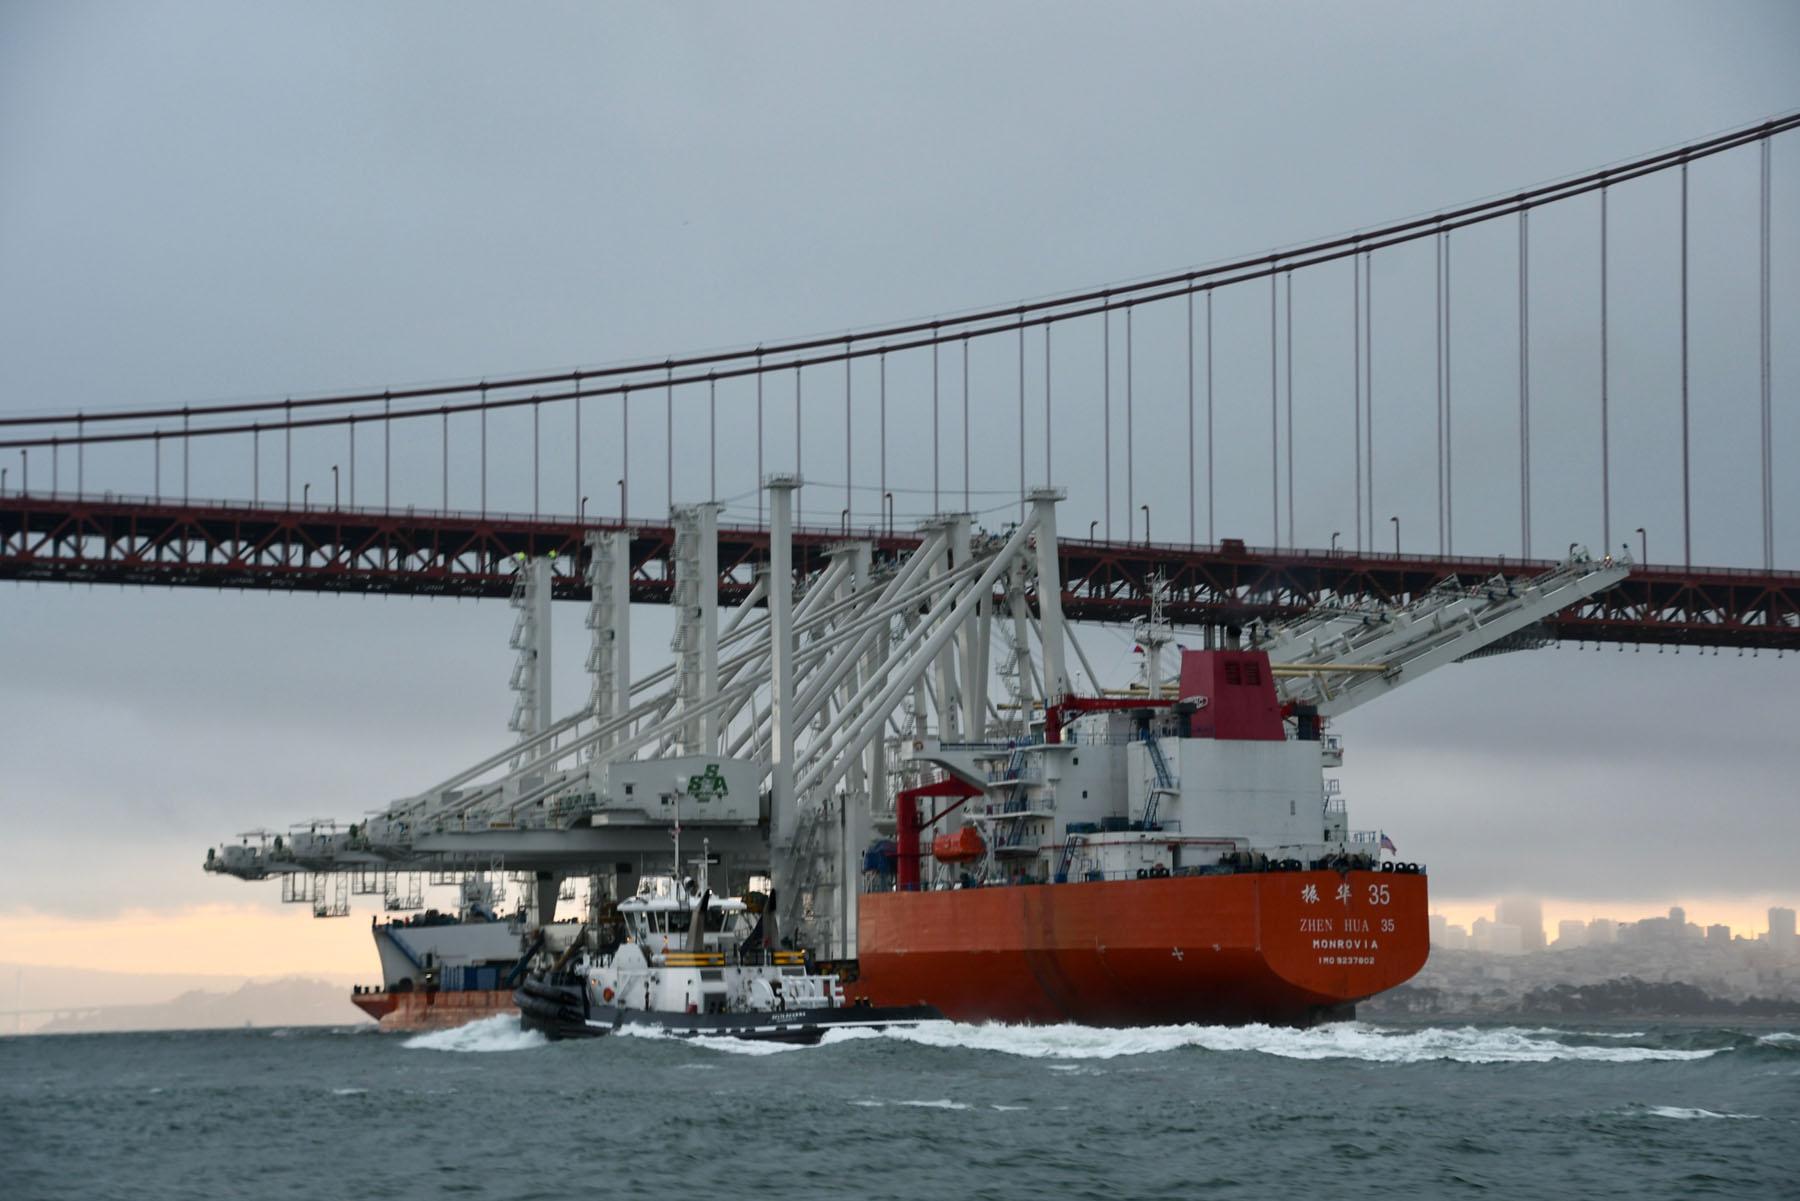 Port of Oakland ZPMC